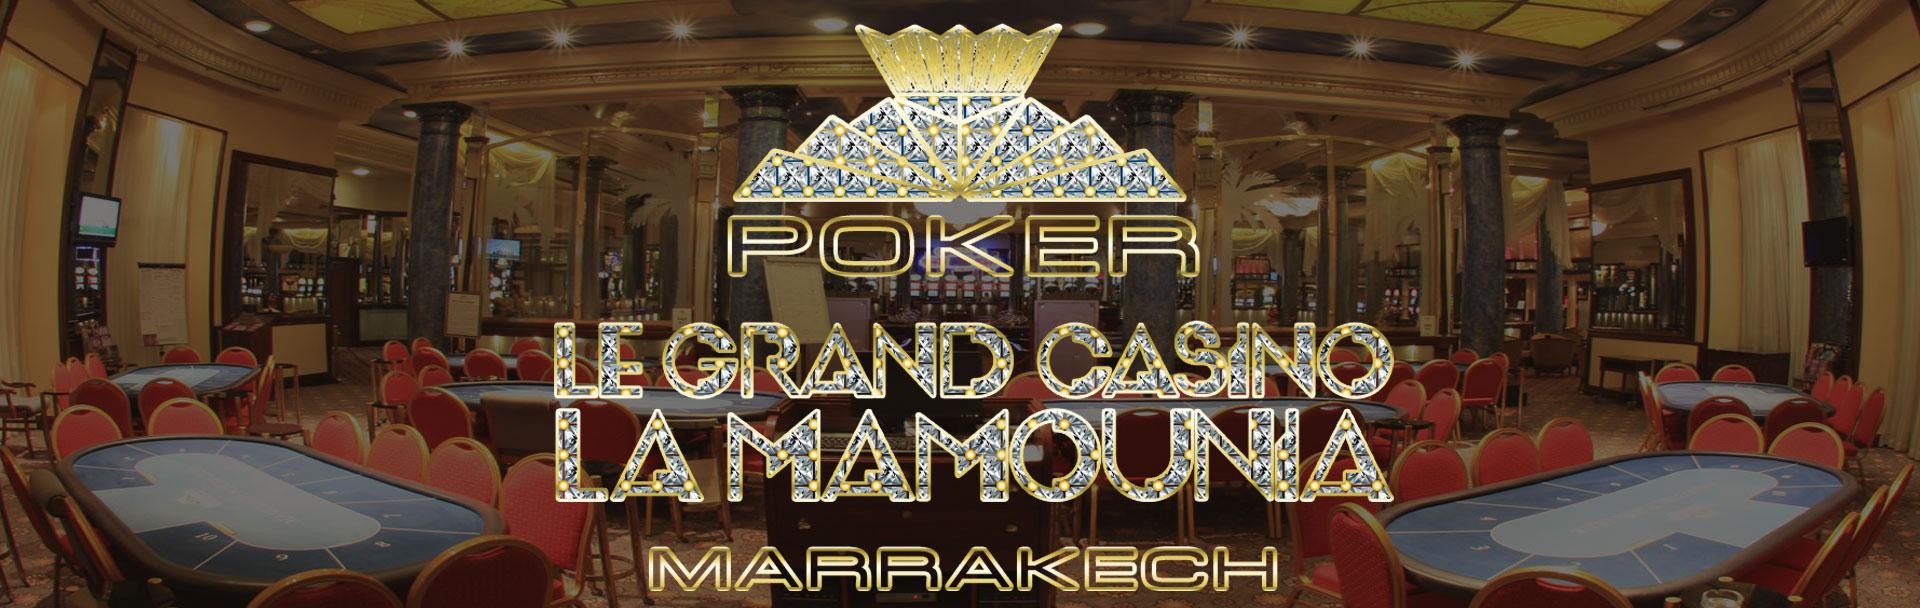 Casino mamounia hilton casino atlantic city resort